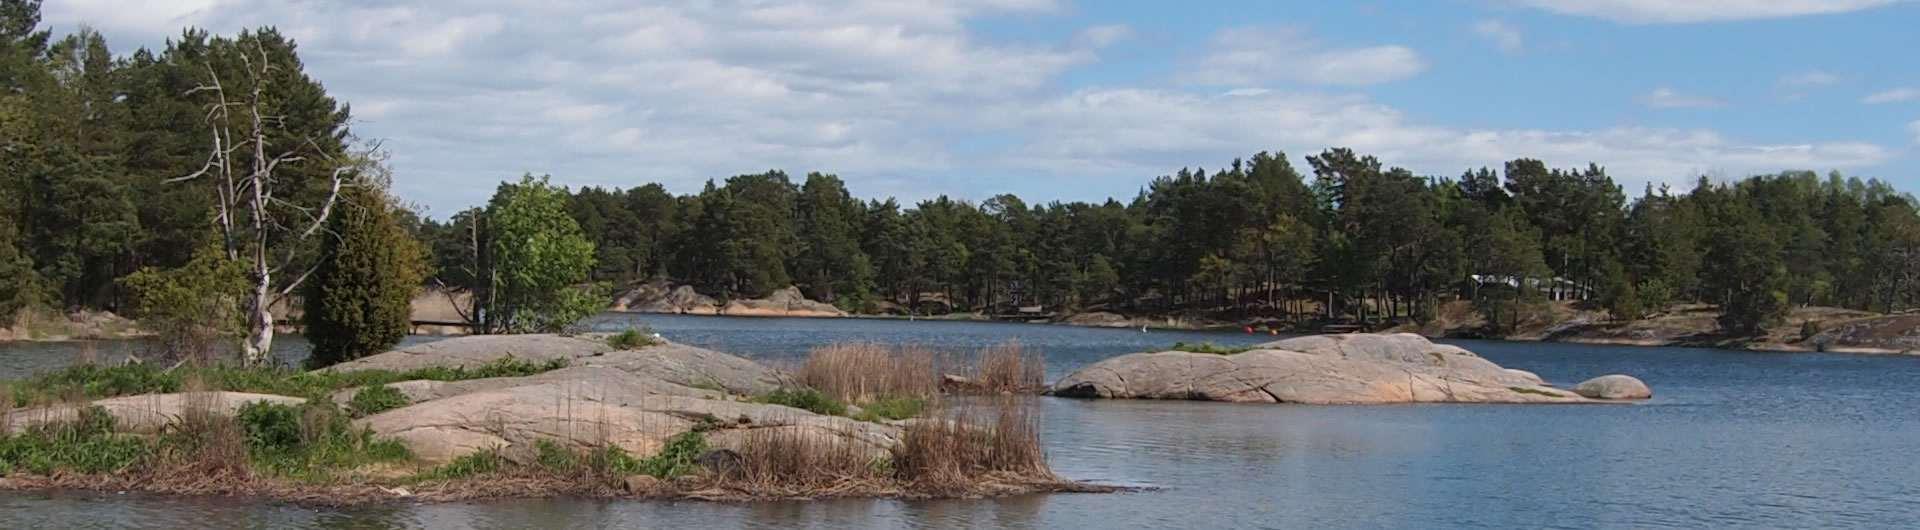 Schweden - Smaland: Ferienhaus am Meer in Oskarshamn